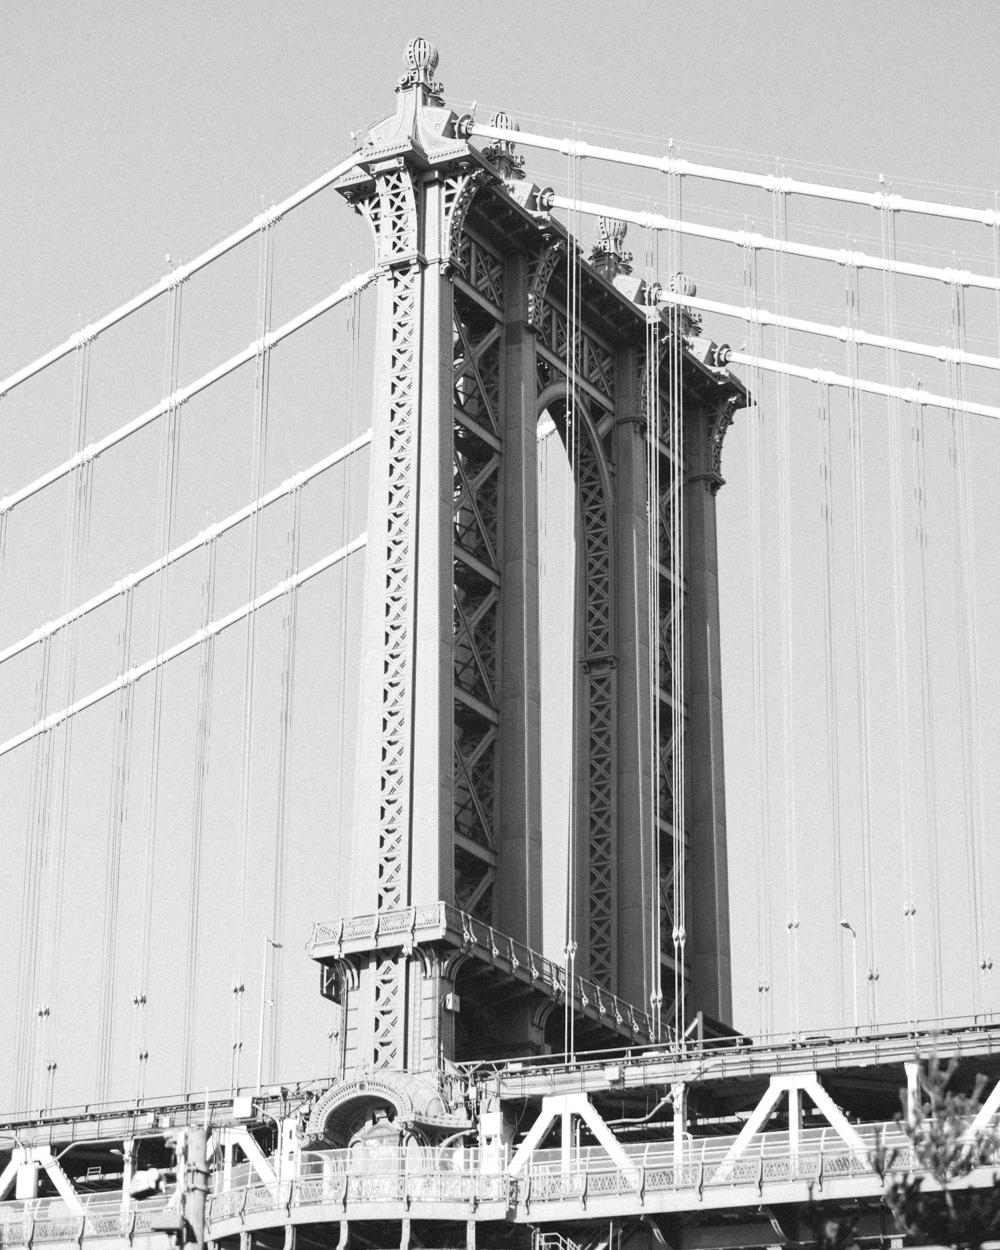 nyc blog-35.jpg